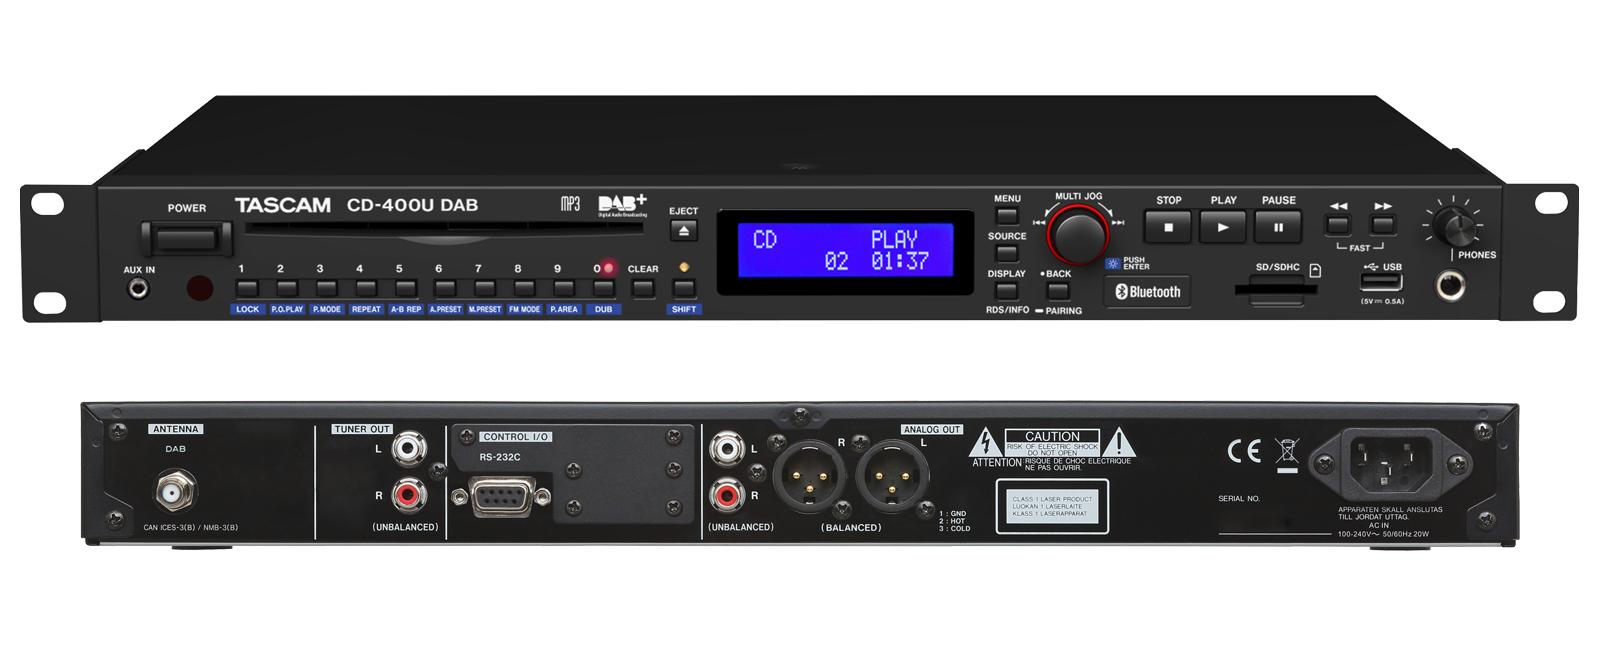 CD-400U DAB | OVERVIEW | TASCAM | International Website